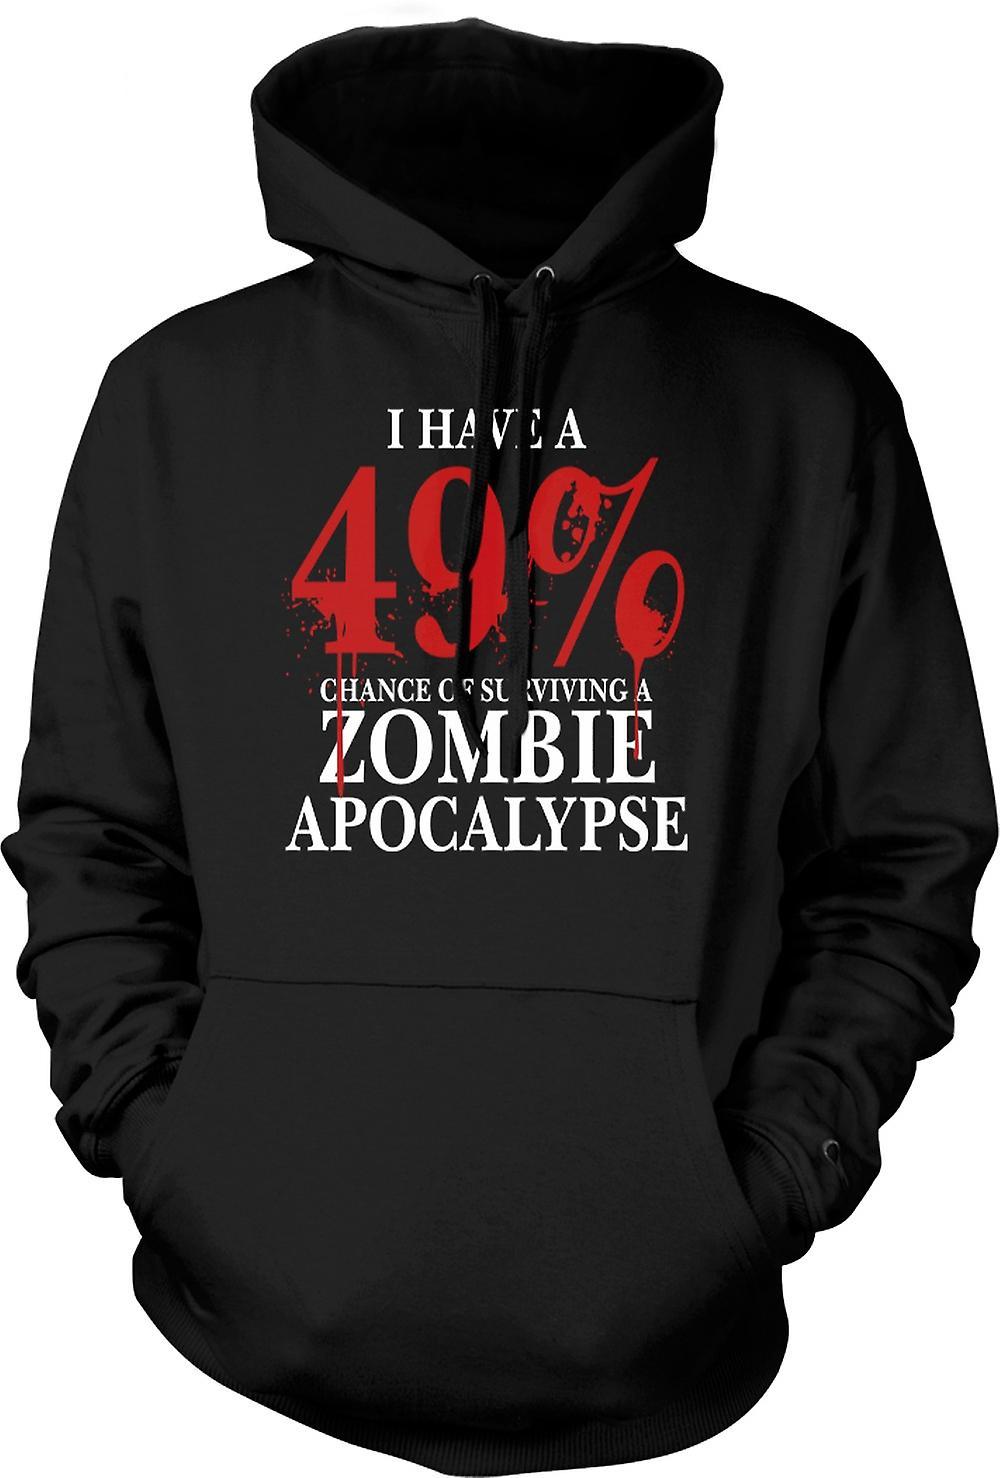 Mens Hoodie - Apocalisse Zombie 49% - Horror divertente